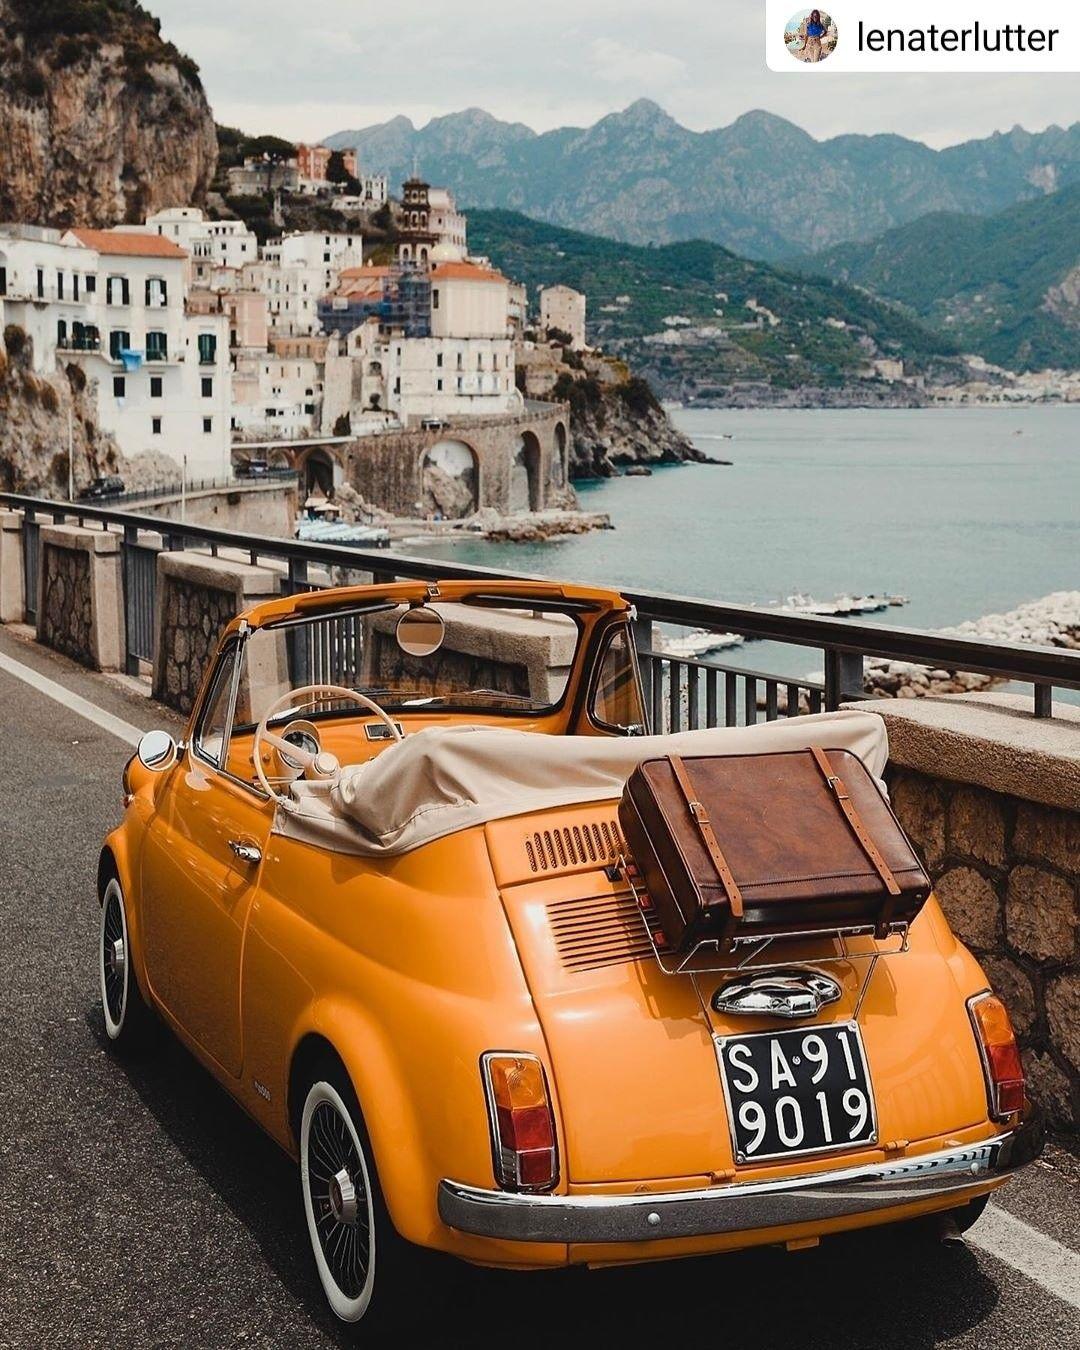 Shooting 📸 Yellow Vintage Fiat 500 Automobile